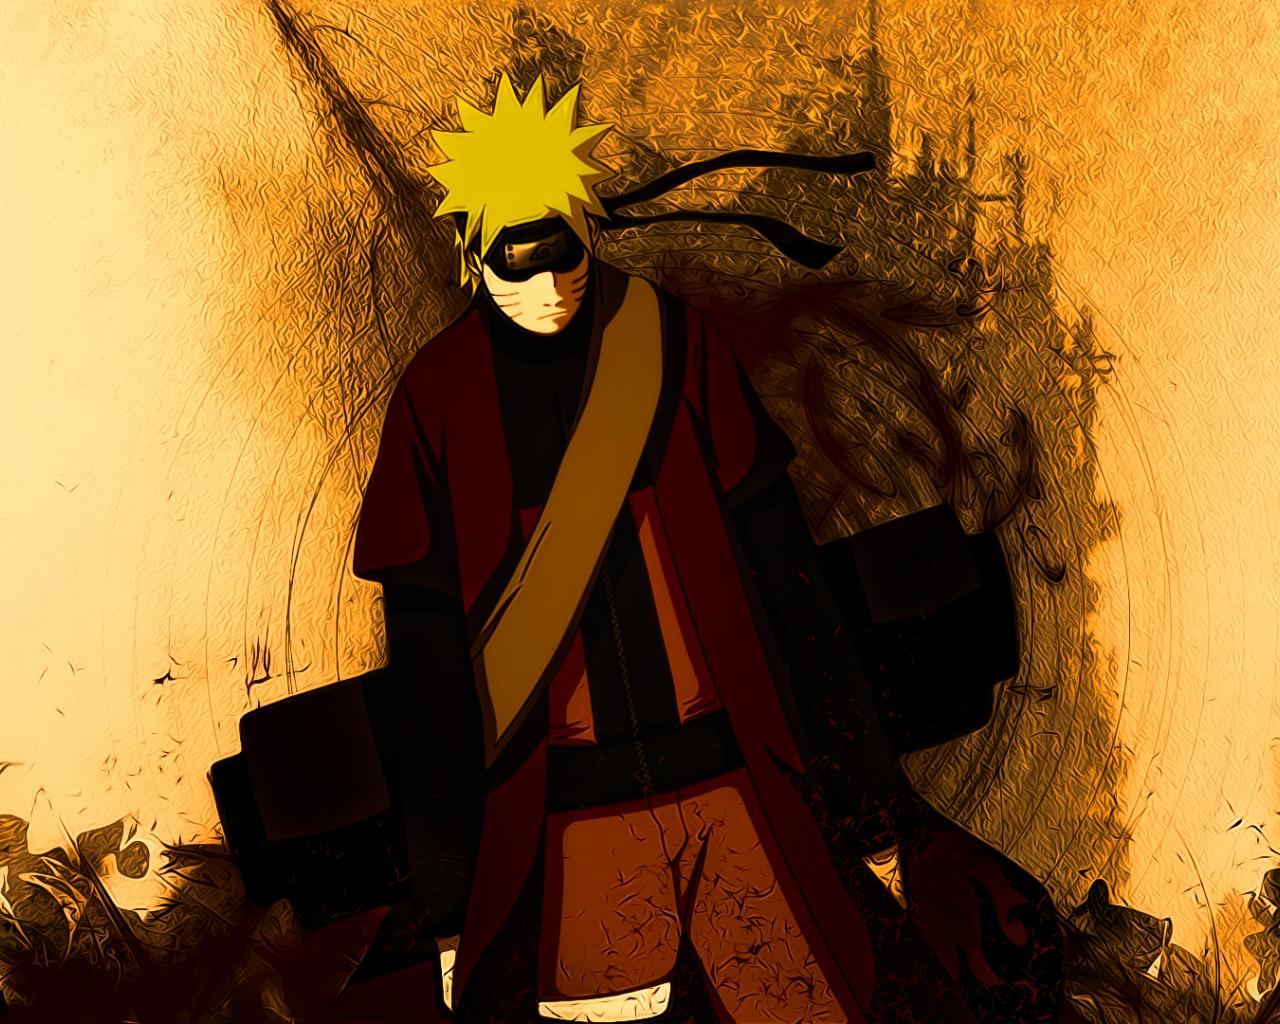 Free download Naruto HD Wallpaper 1920x1080 19095 HD Wallpaper Res 1920x1080 1920x1080 for ...